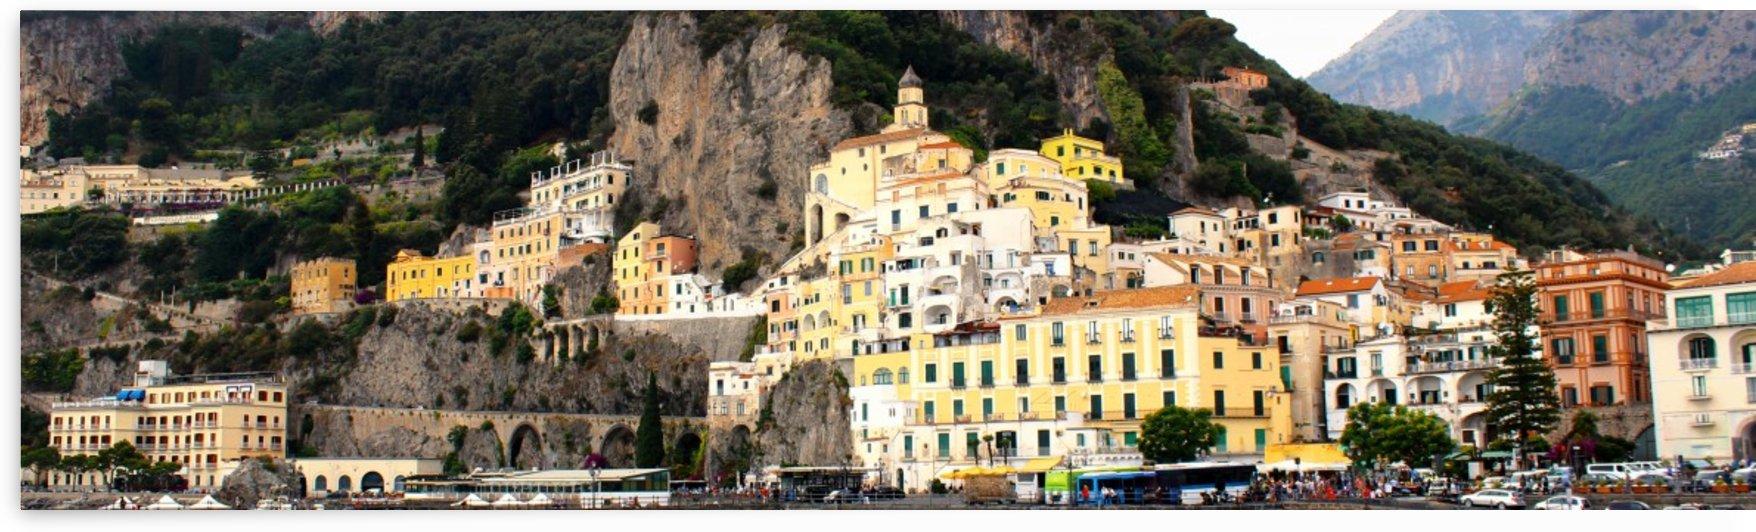 Amalfi Coast Super Panoramic  by Bentivoglio Photography